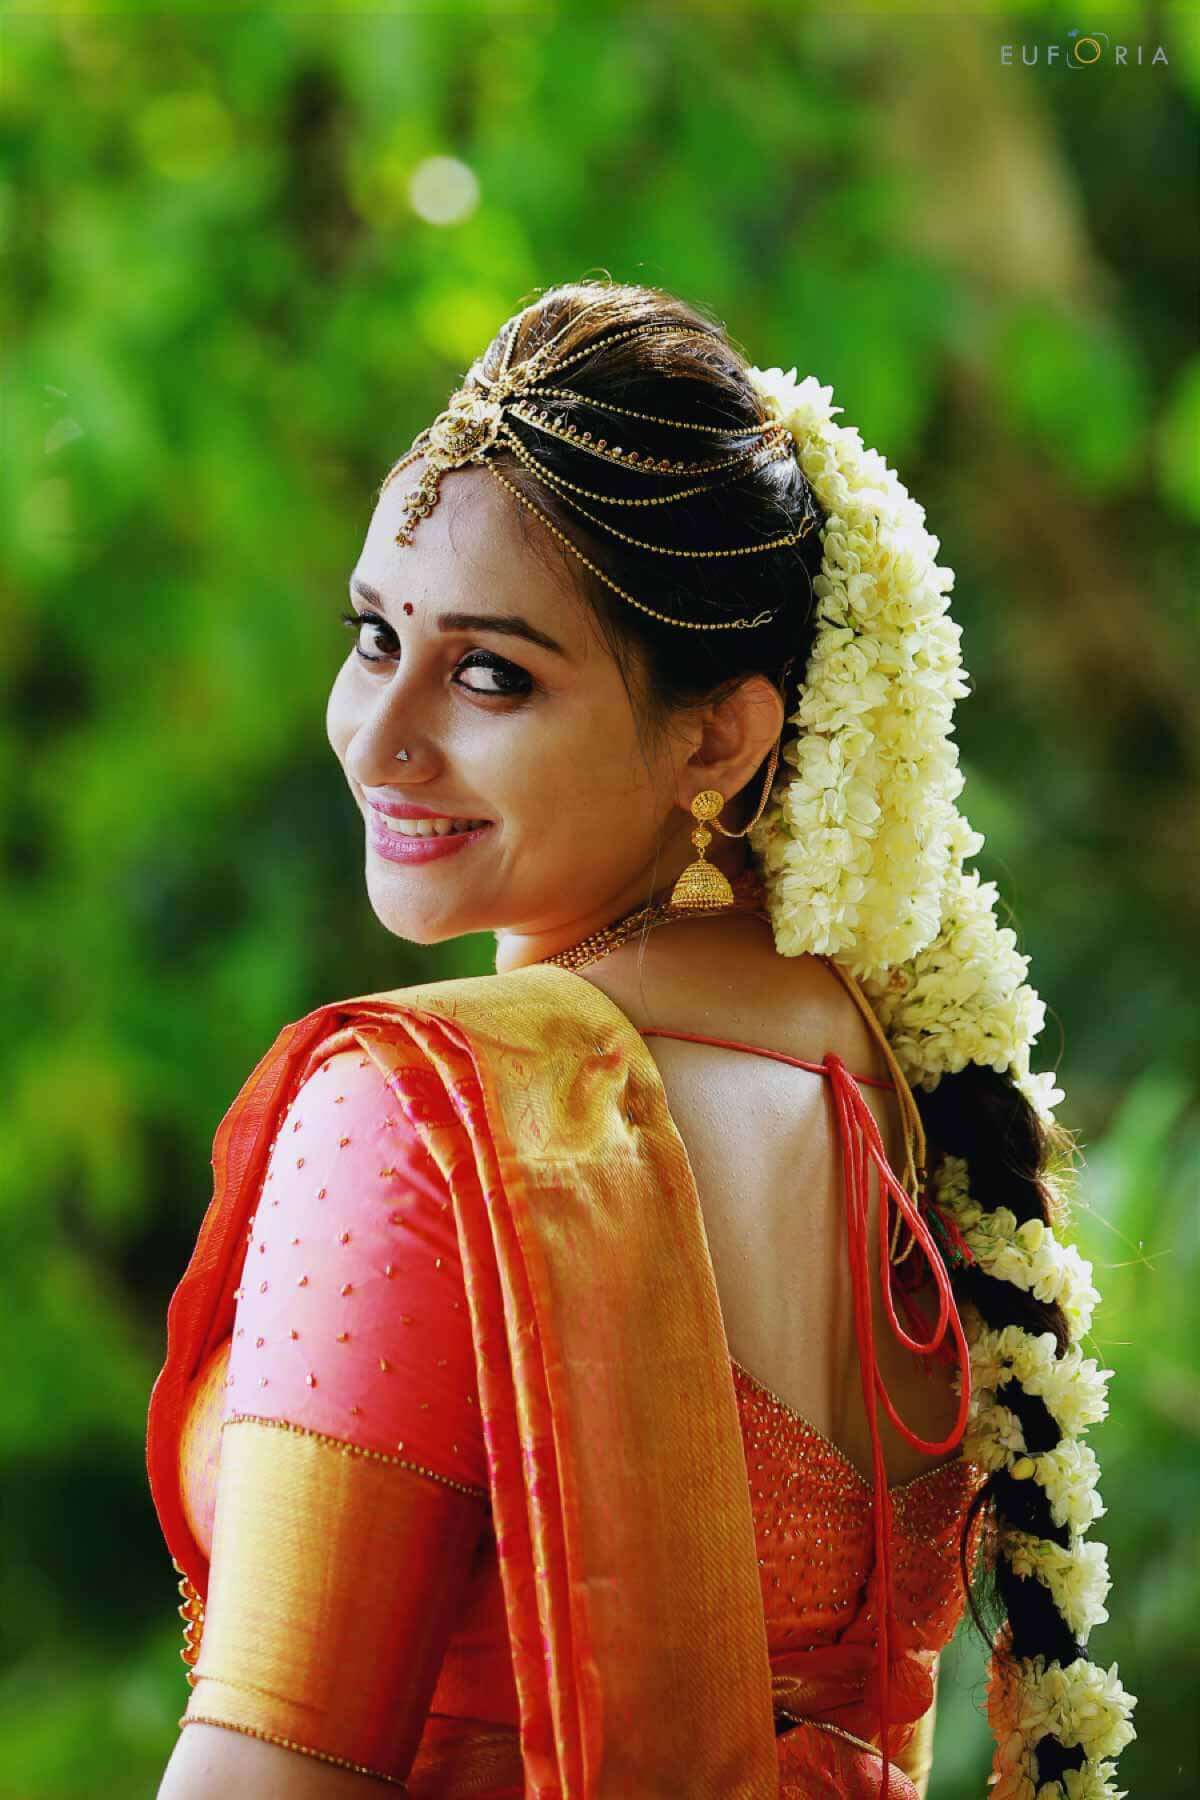 Euforia Best wedding photography company based in Kerala India